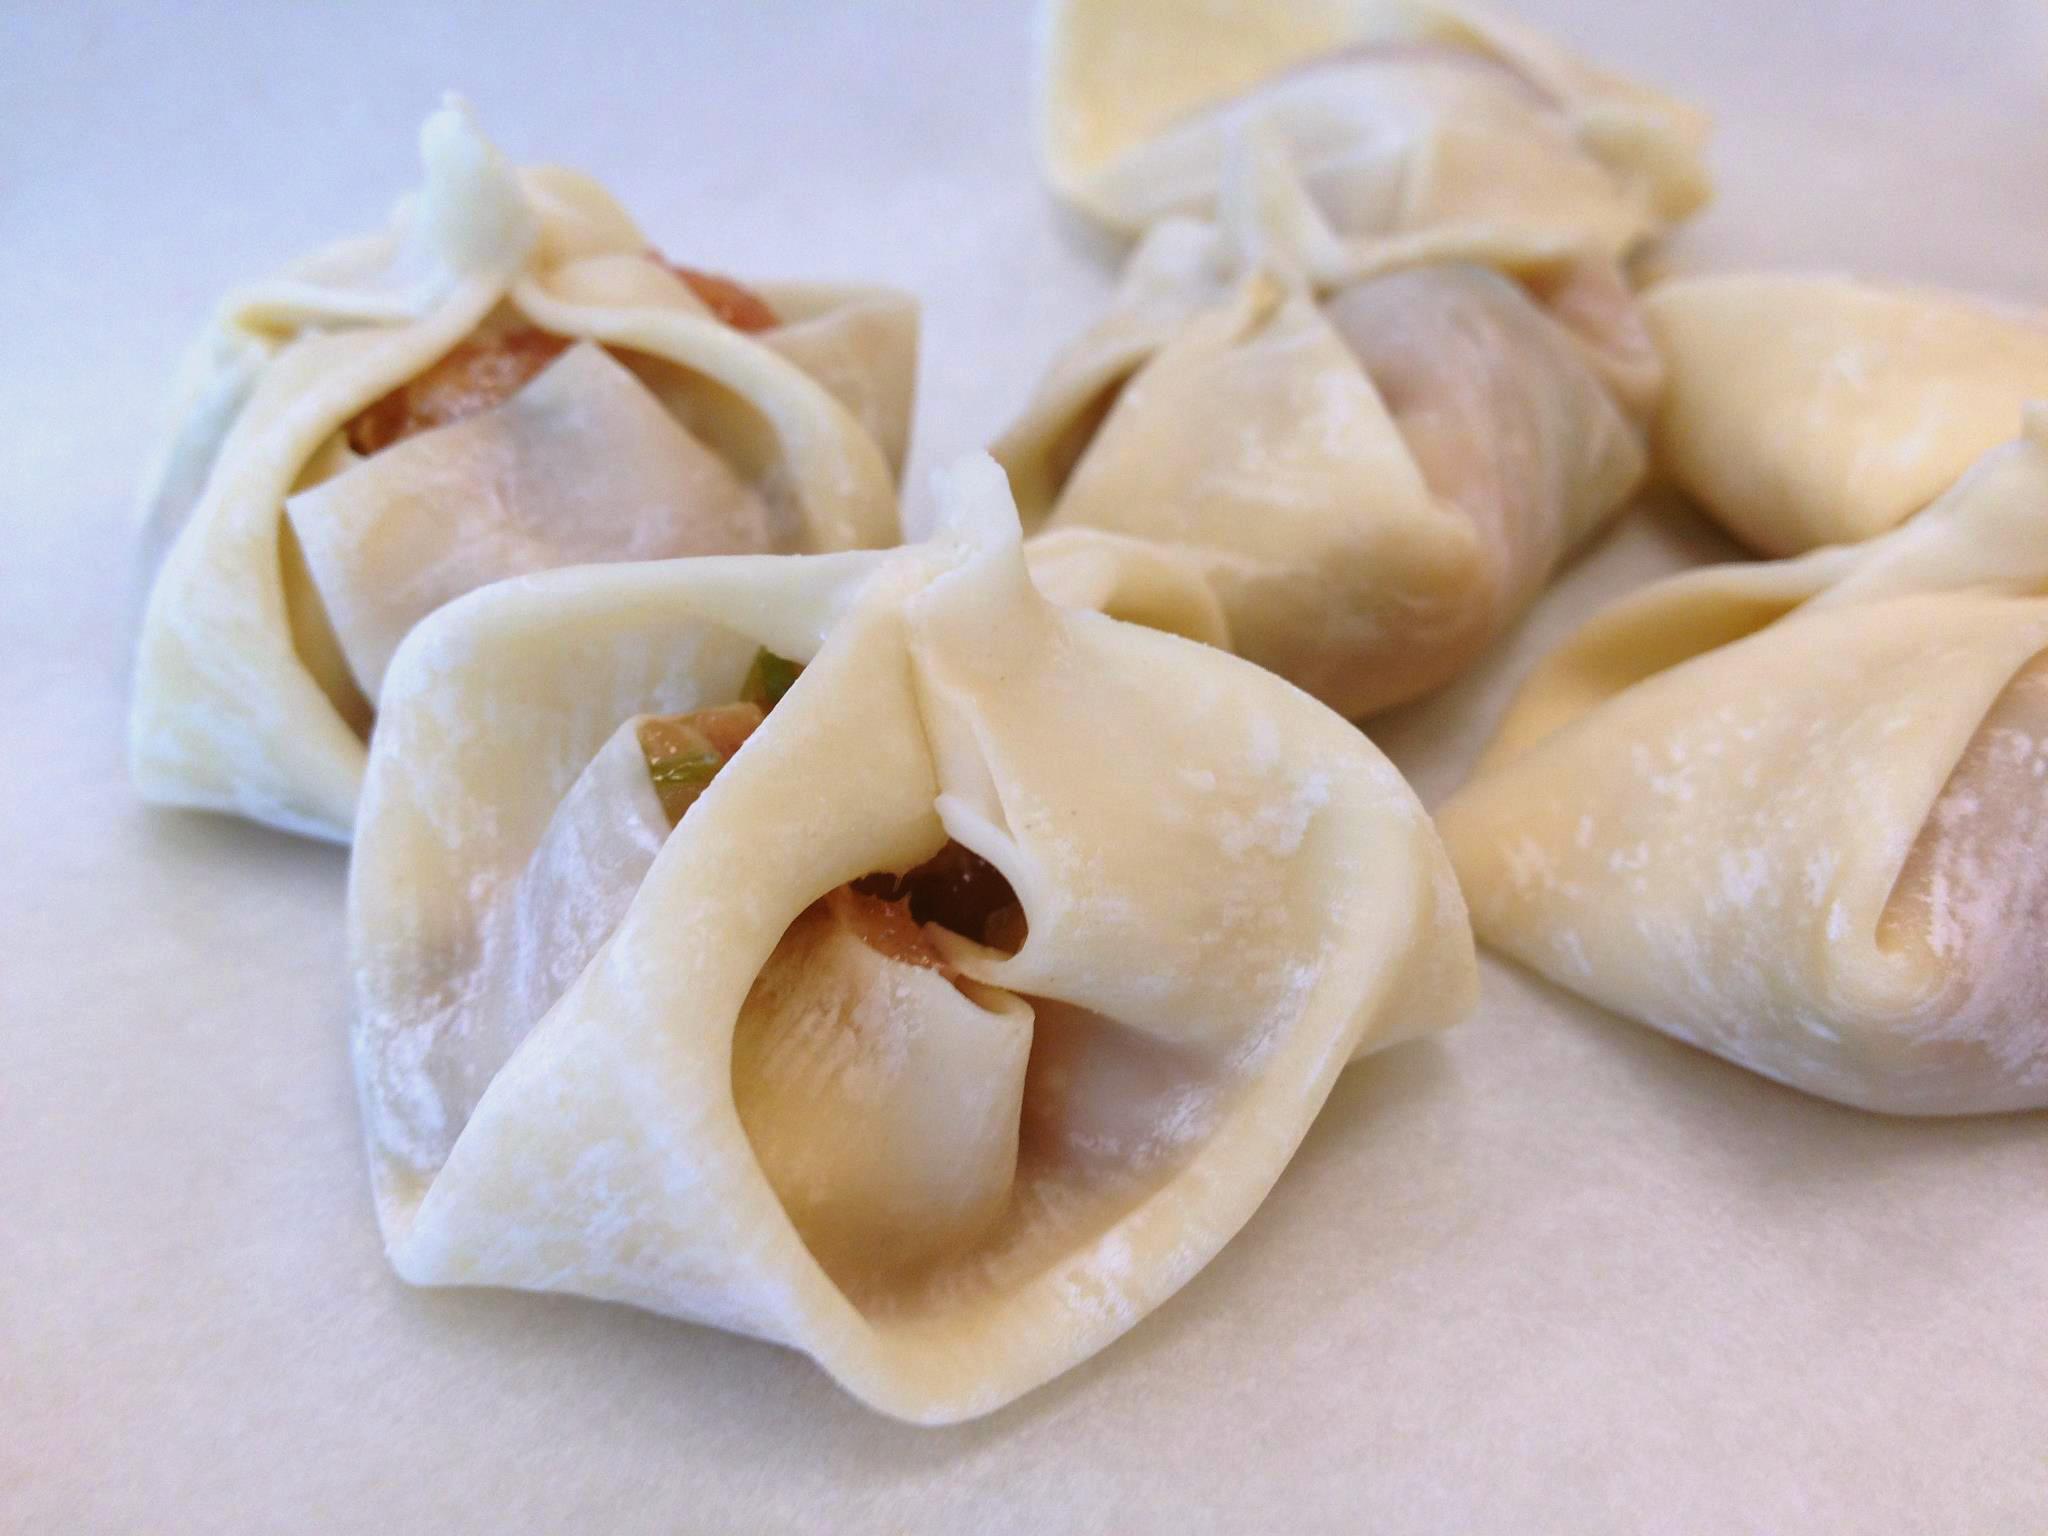 Red Book Chef Austin Texas Wedding Event Caterer dumplings